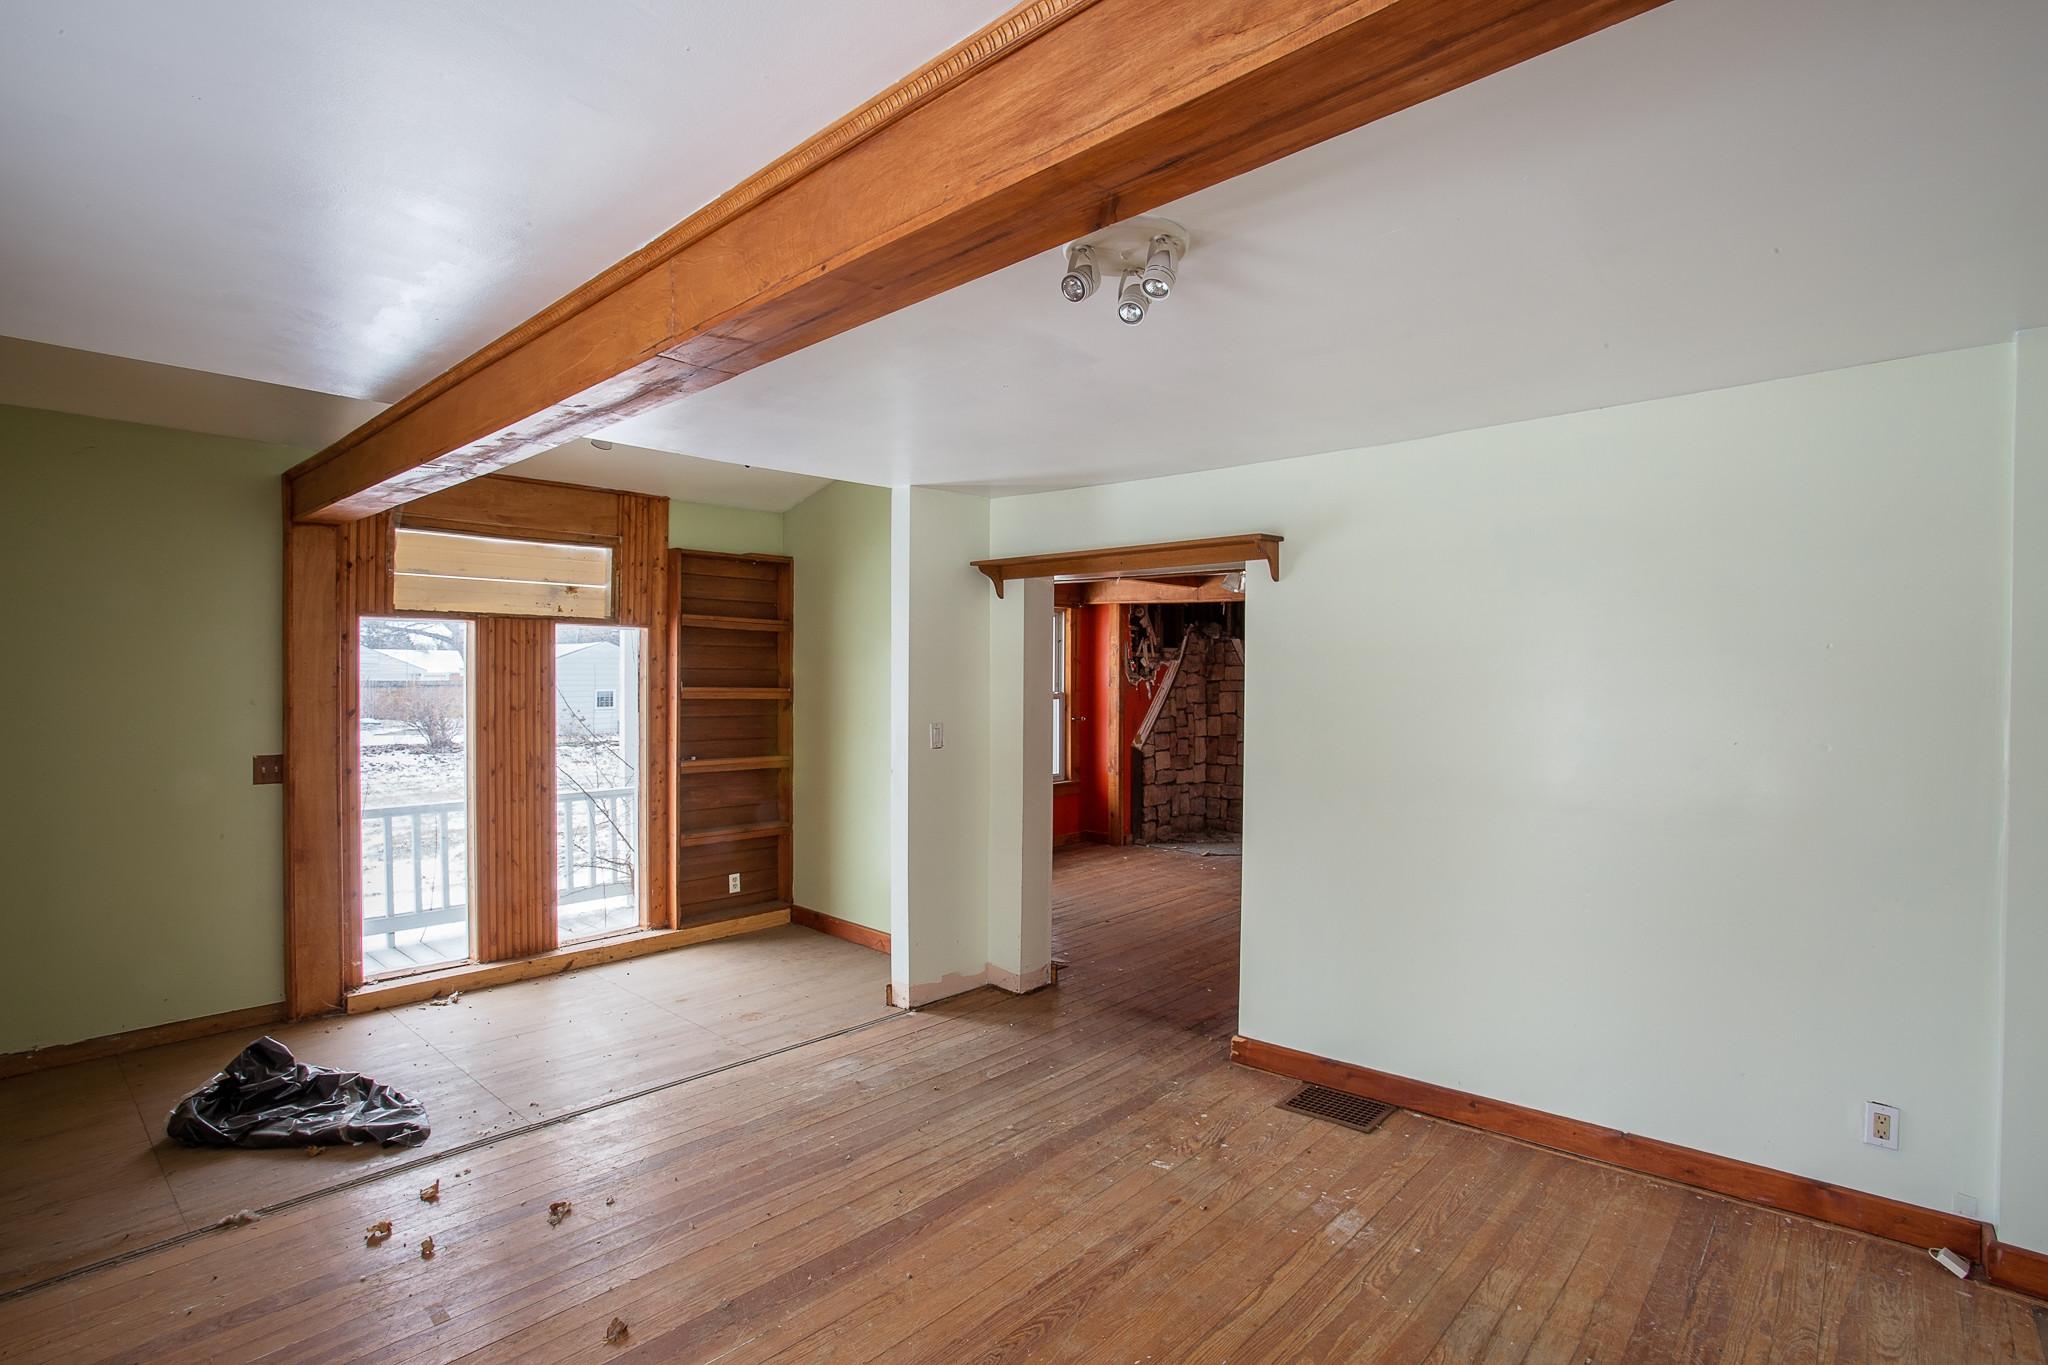 hardwood flooring detroit mi of 25150 joy redford township historical commission within but